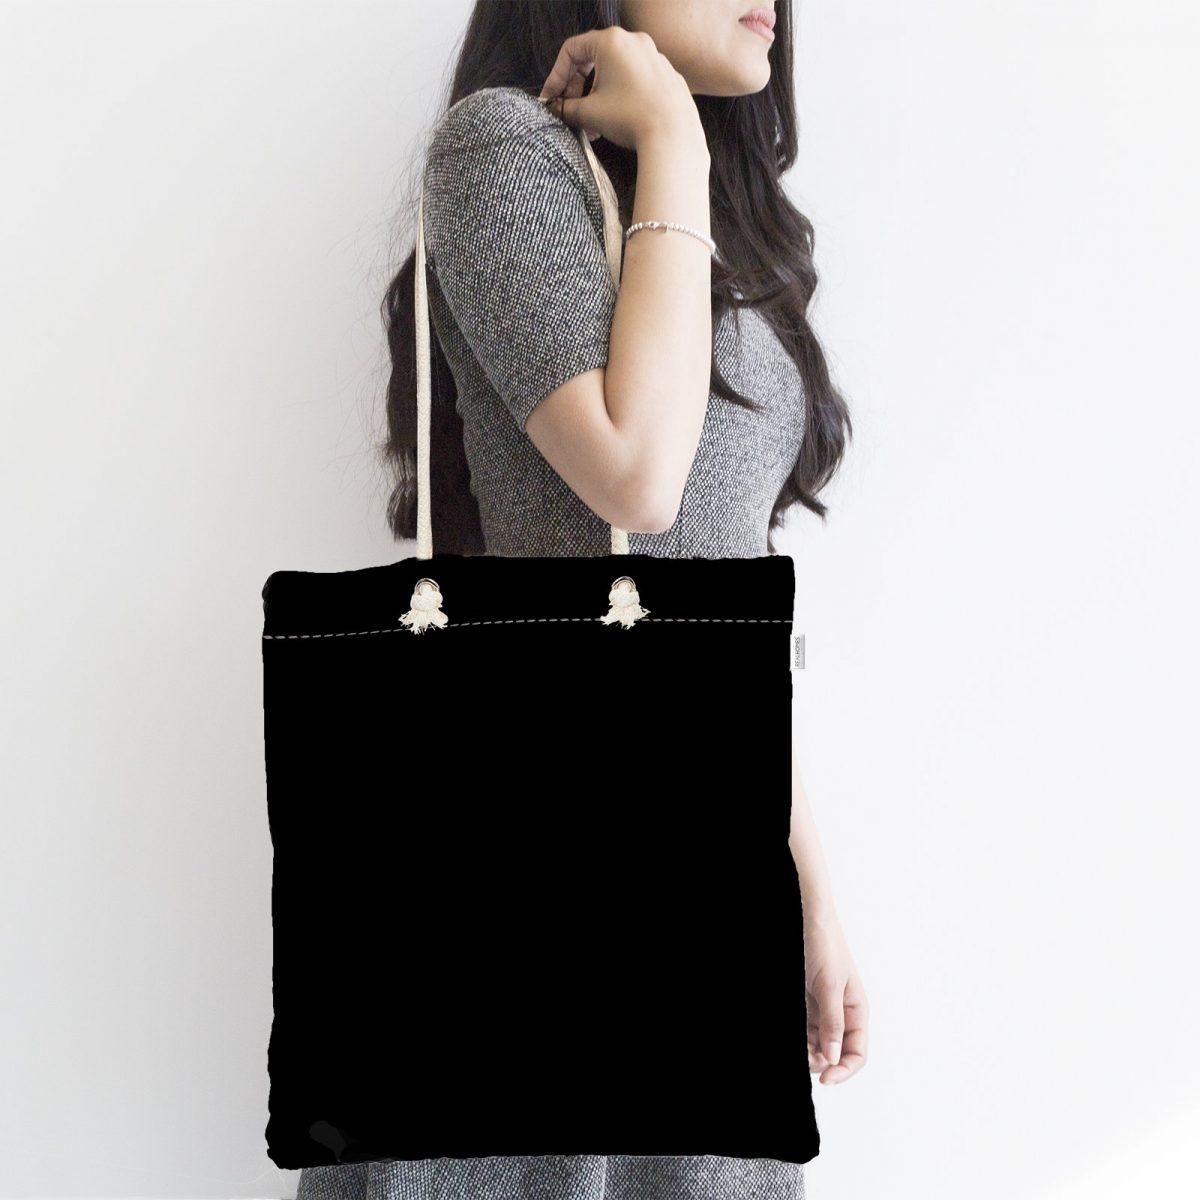 Siyah Renkli Dijital Baskılı Fermuarlı Kumaş Çanta Realhomes